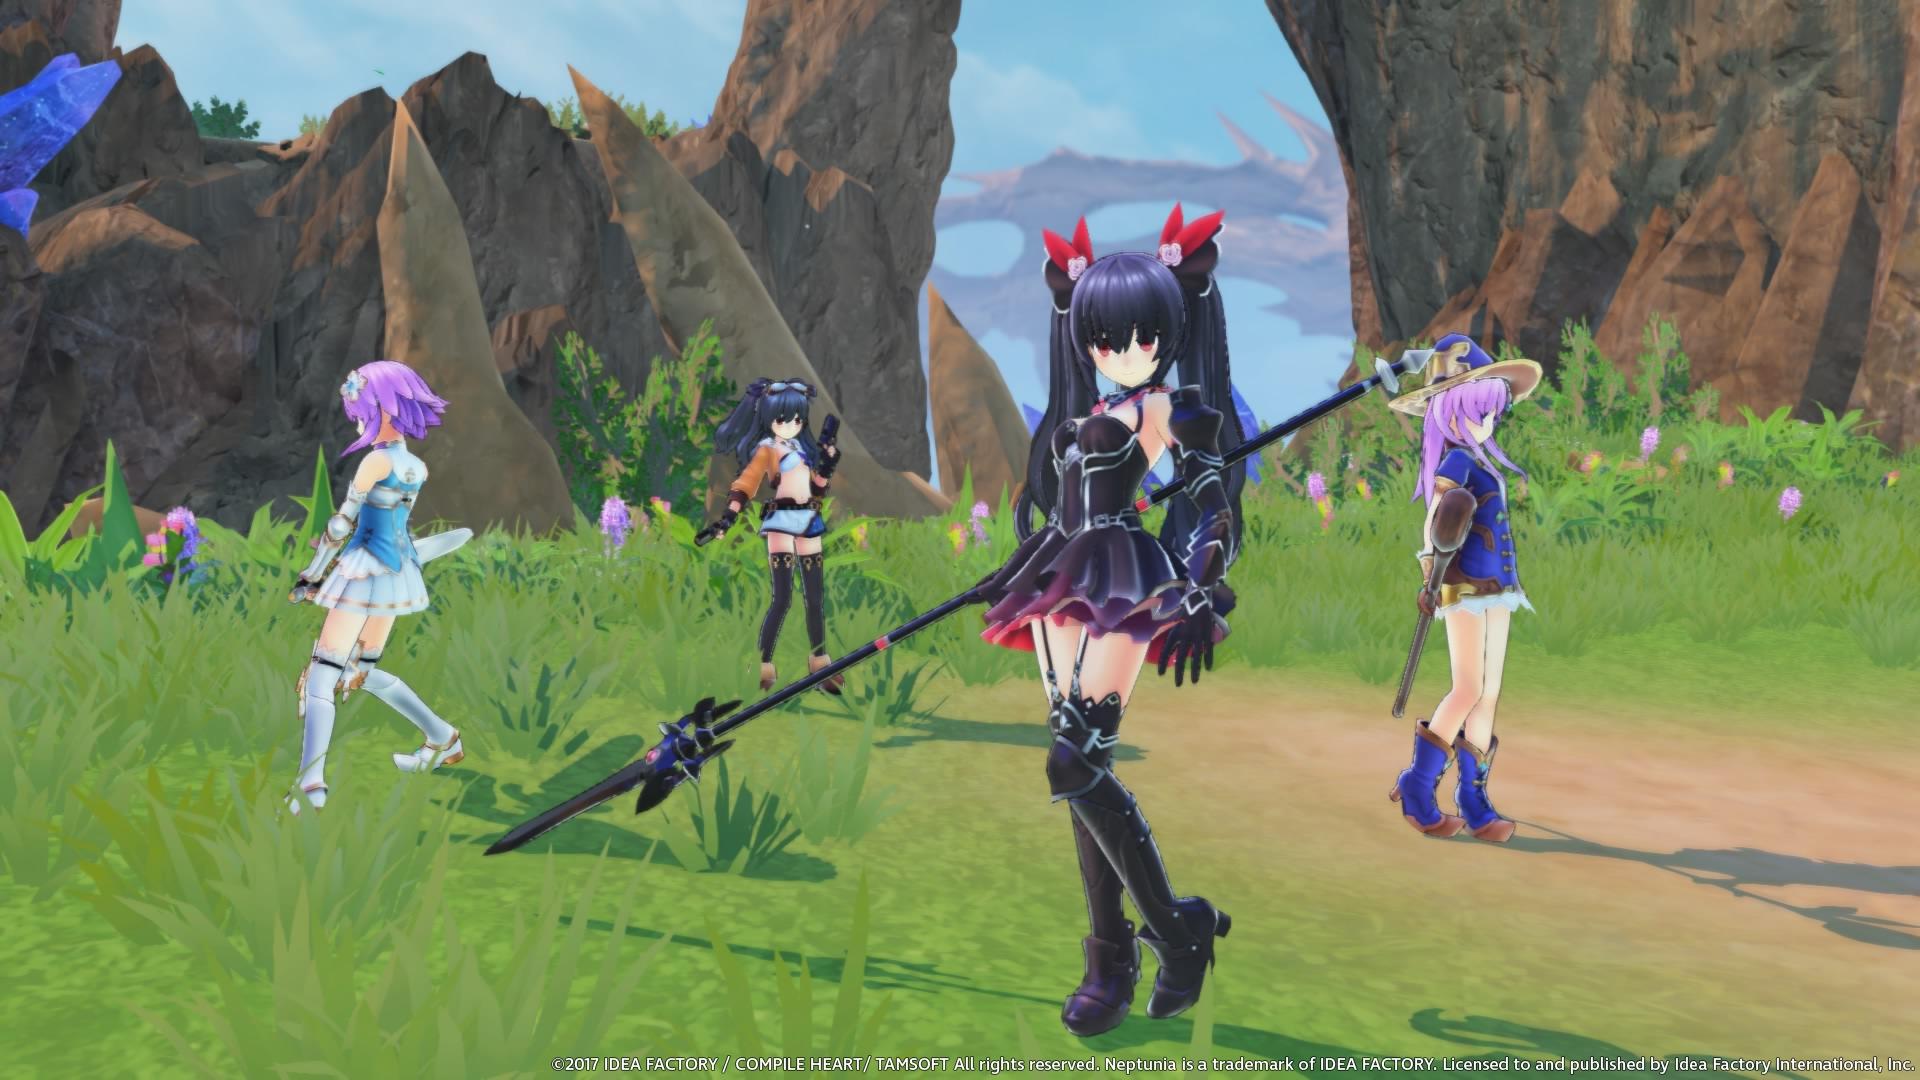 Cyberdimension Neptunia: 4 Goddesses Online (PlayStation 4) - Otaku